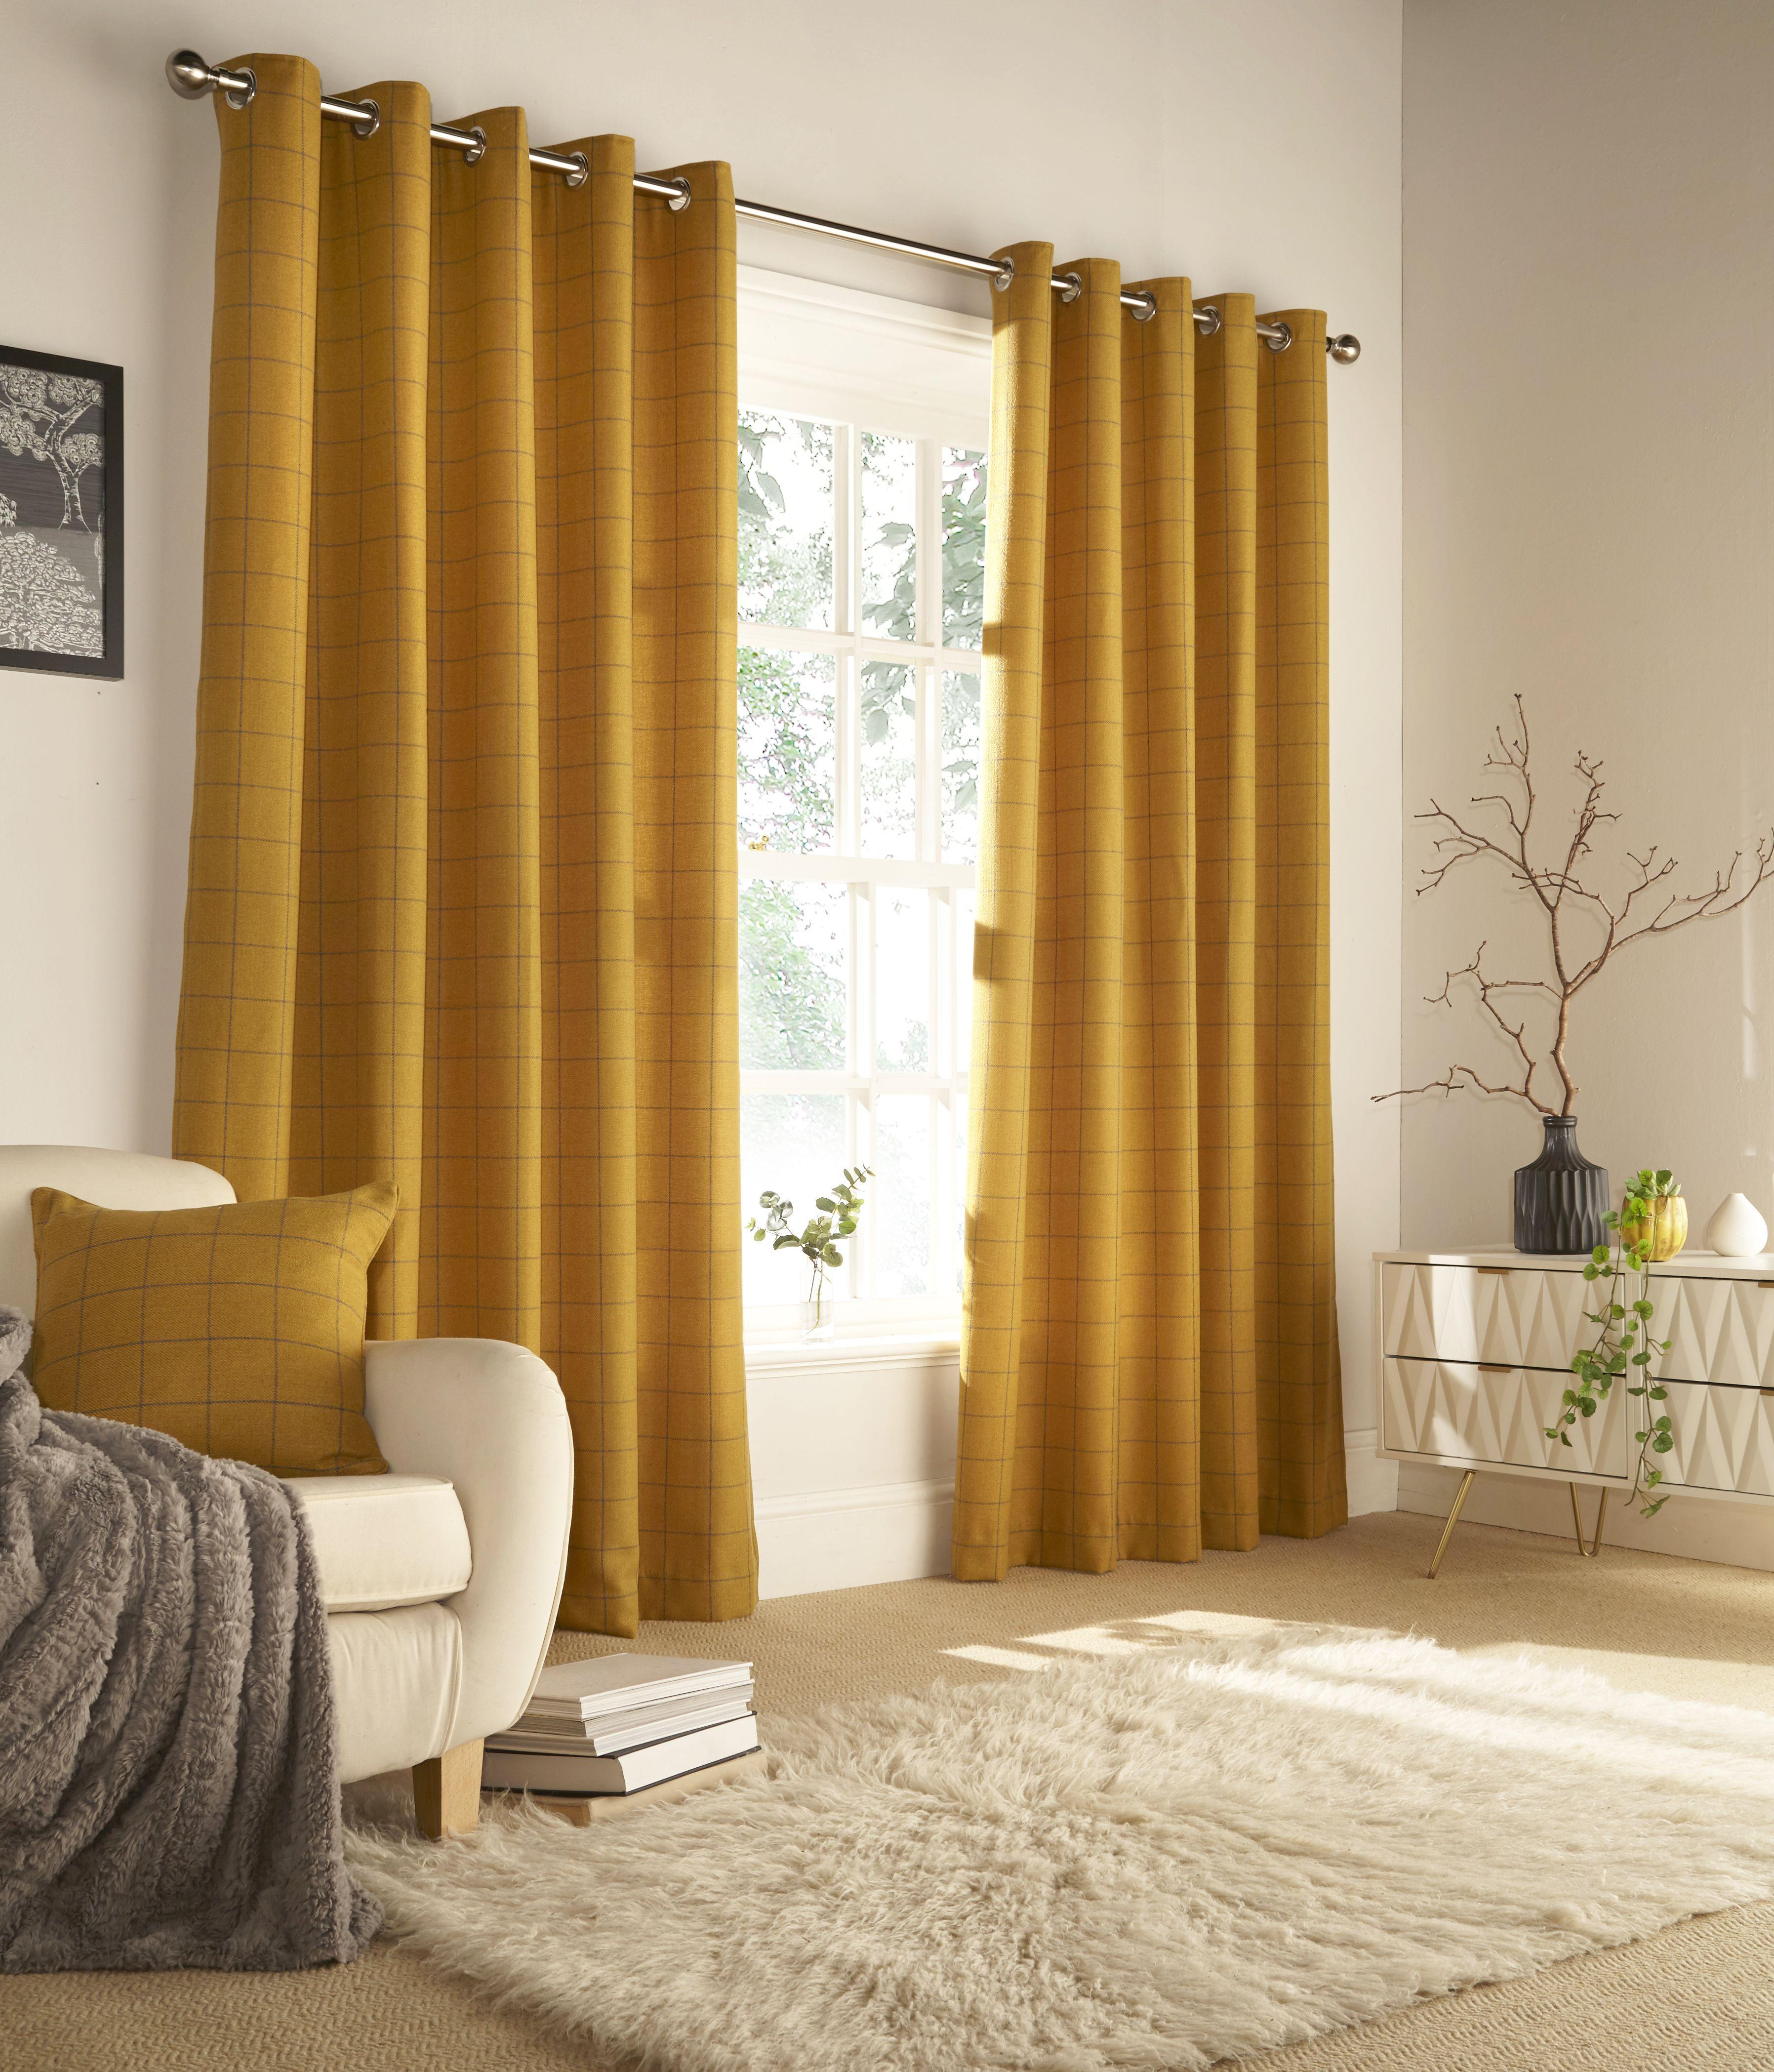 Ellis Windowpane Check Eyelet Curtains in Ochre